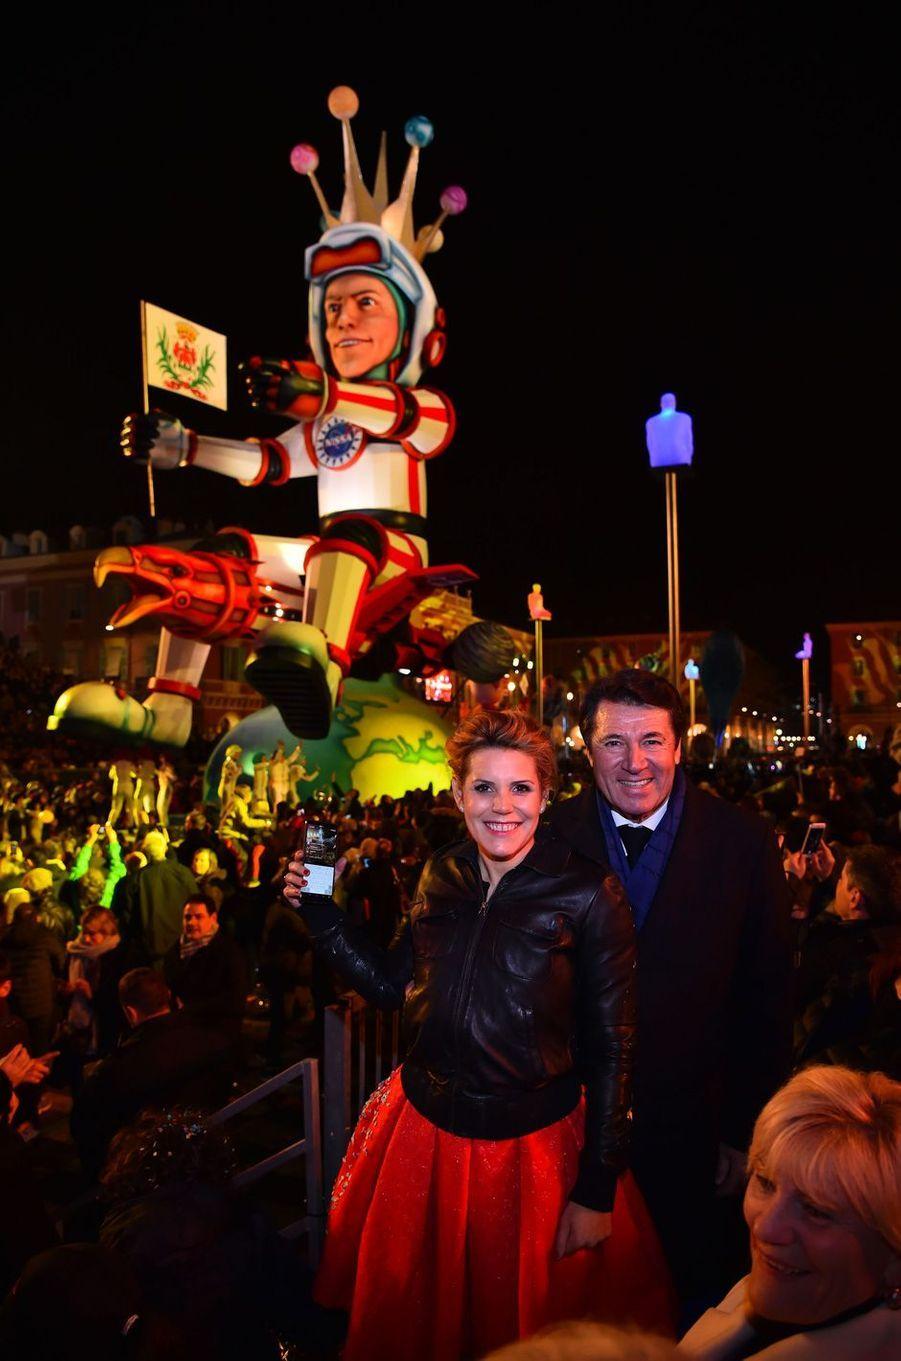 Christian Estrosi et son épouse Laura Tenoudji samedi soir au Carnaval de Nice.